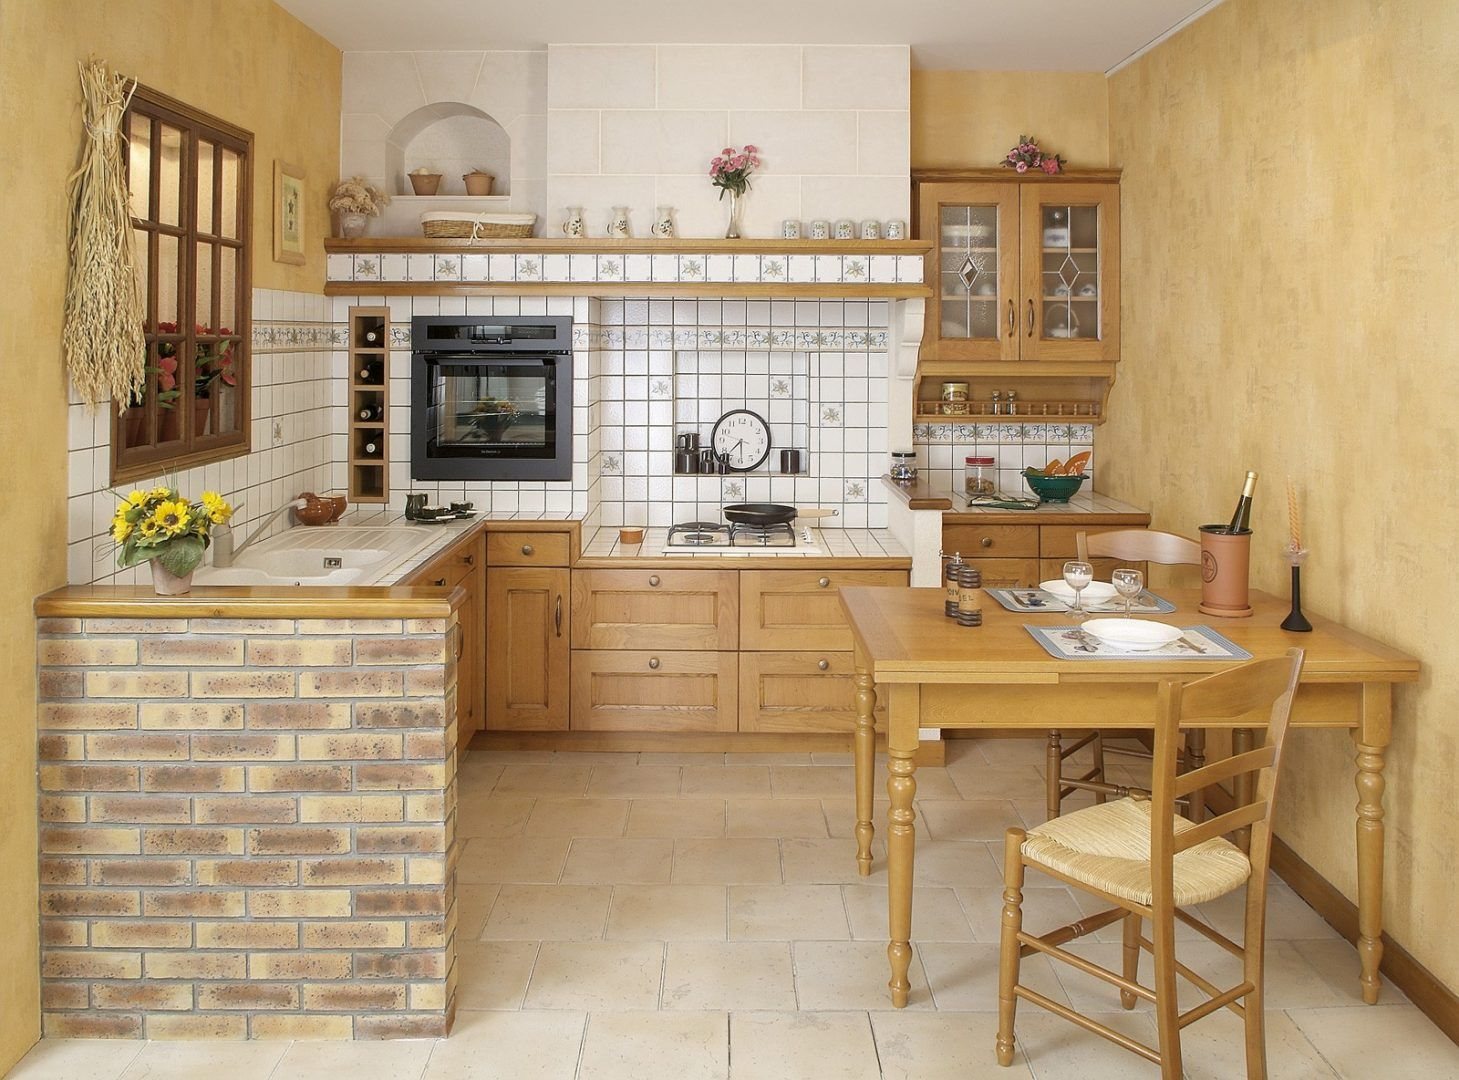 ideas para decorar cocinas rsticas